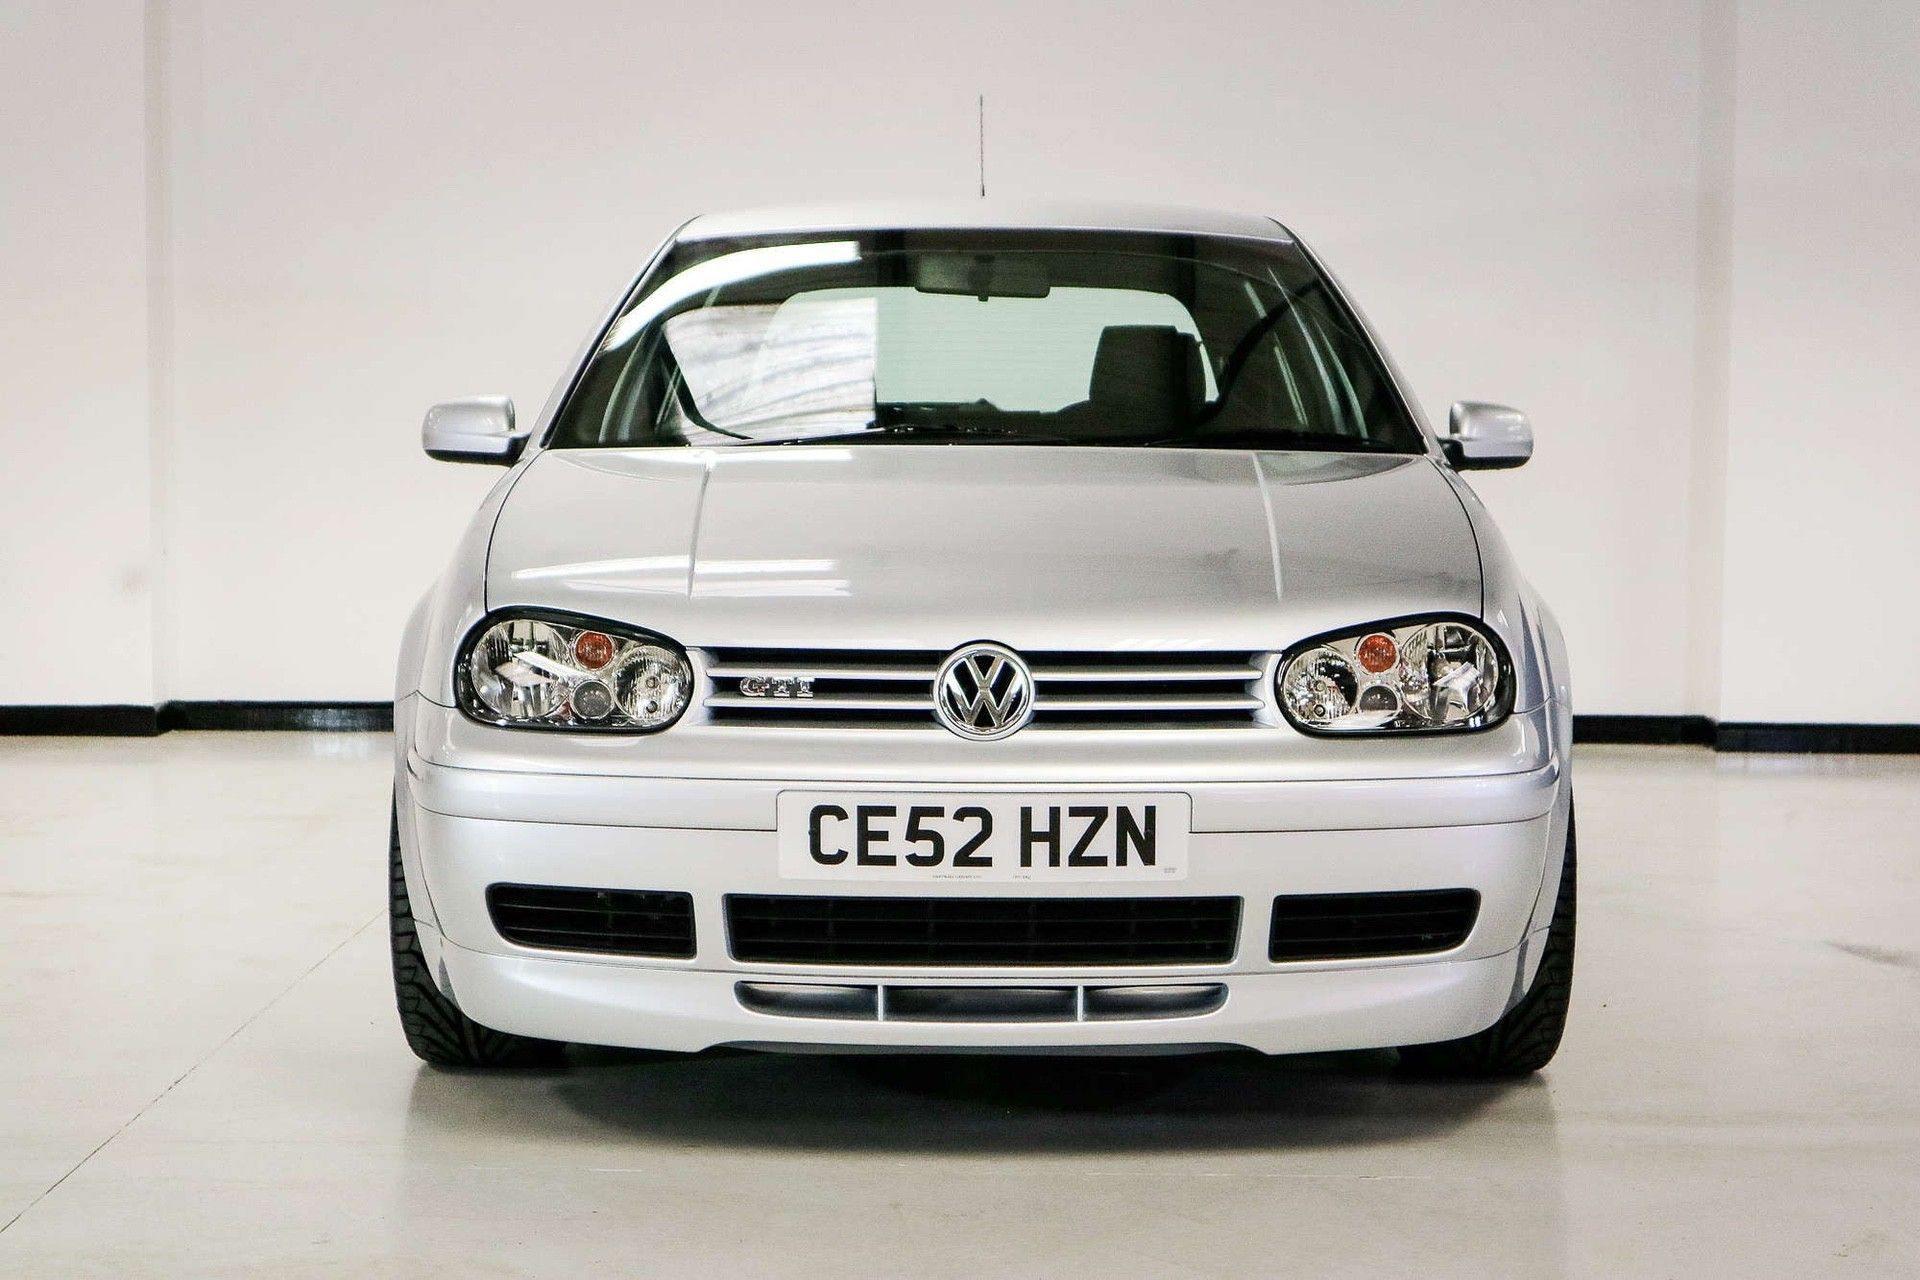 2002_VW_Golf_GTI_25th_Anniversary_Edition_sale-0001